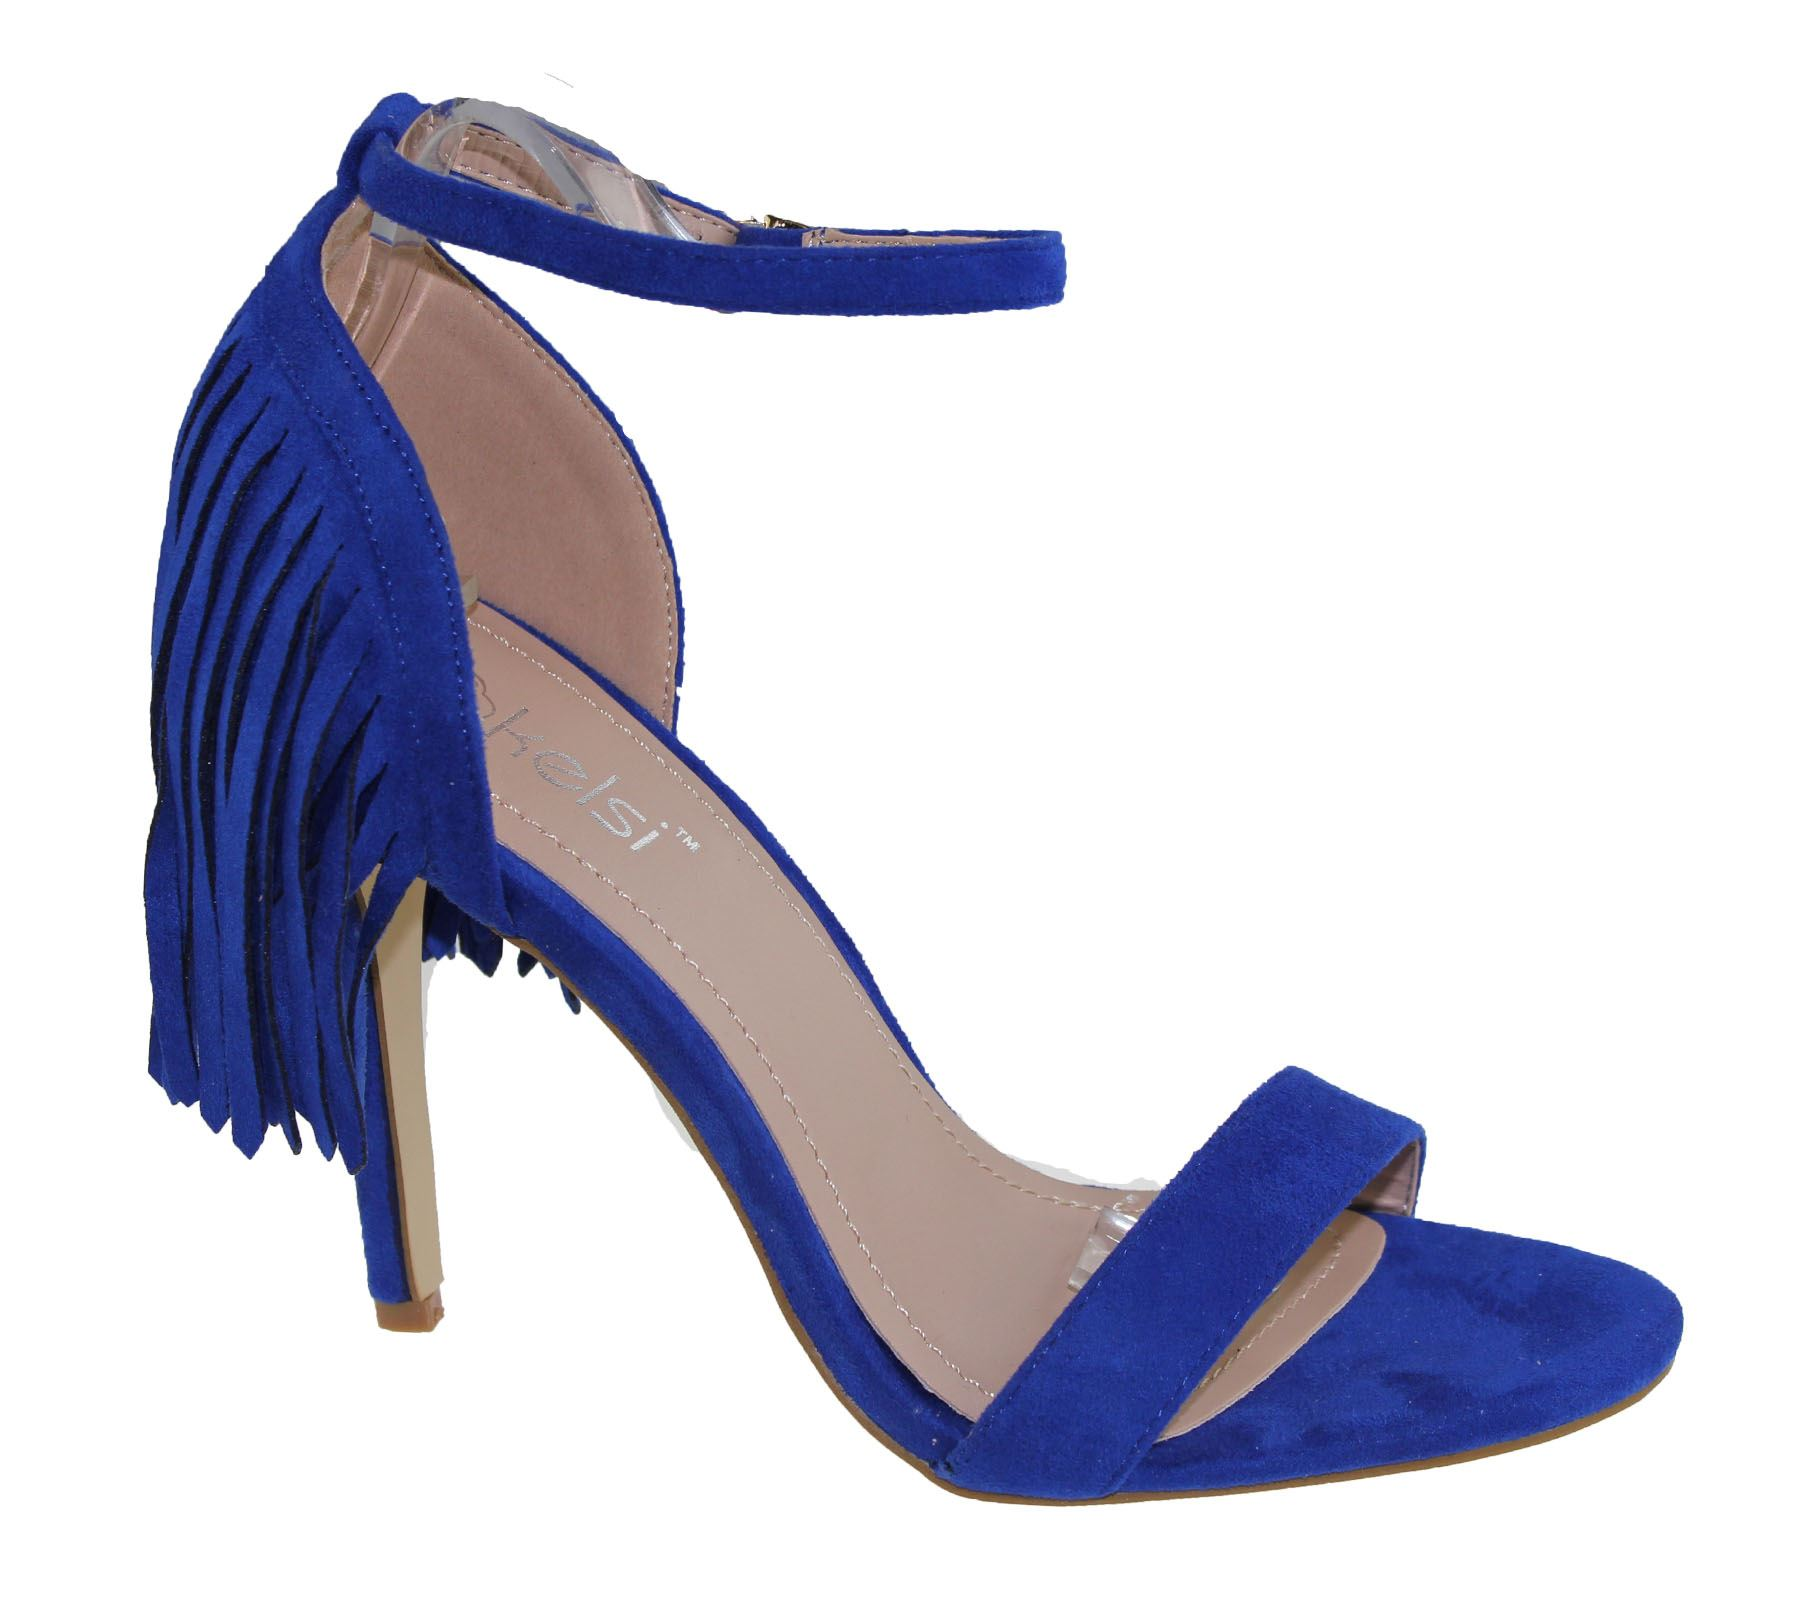 Womens Sandals Stiletto High Heel Tassel Ladies Open Toe Summer ... 528e526d7e6